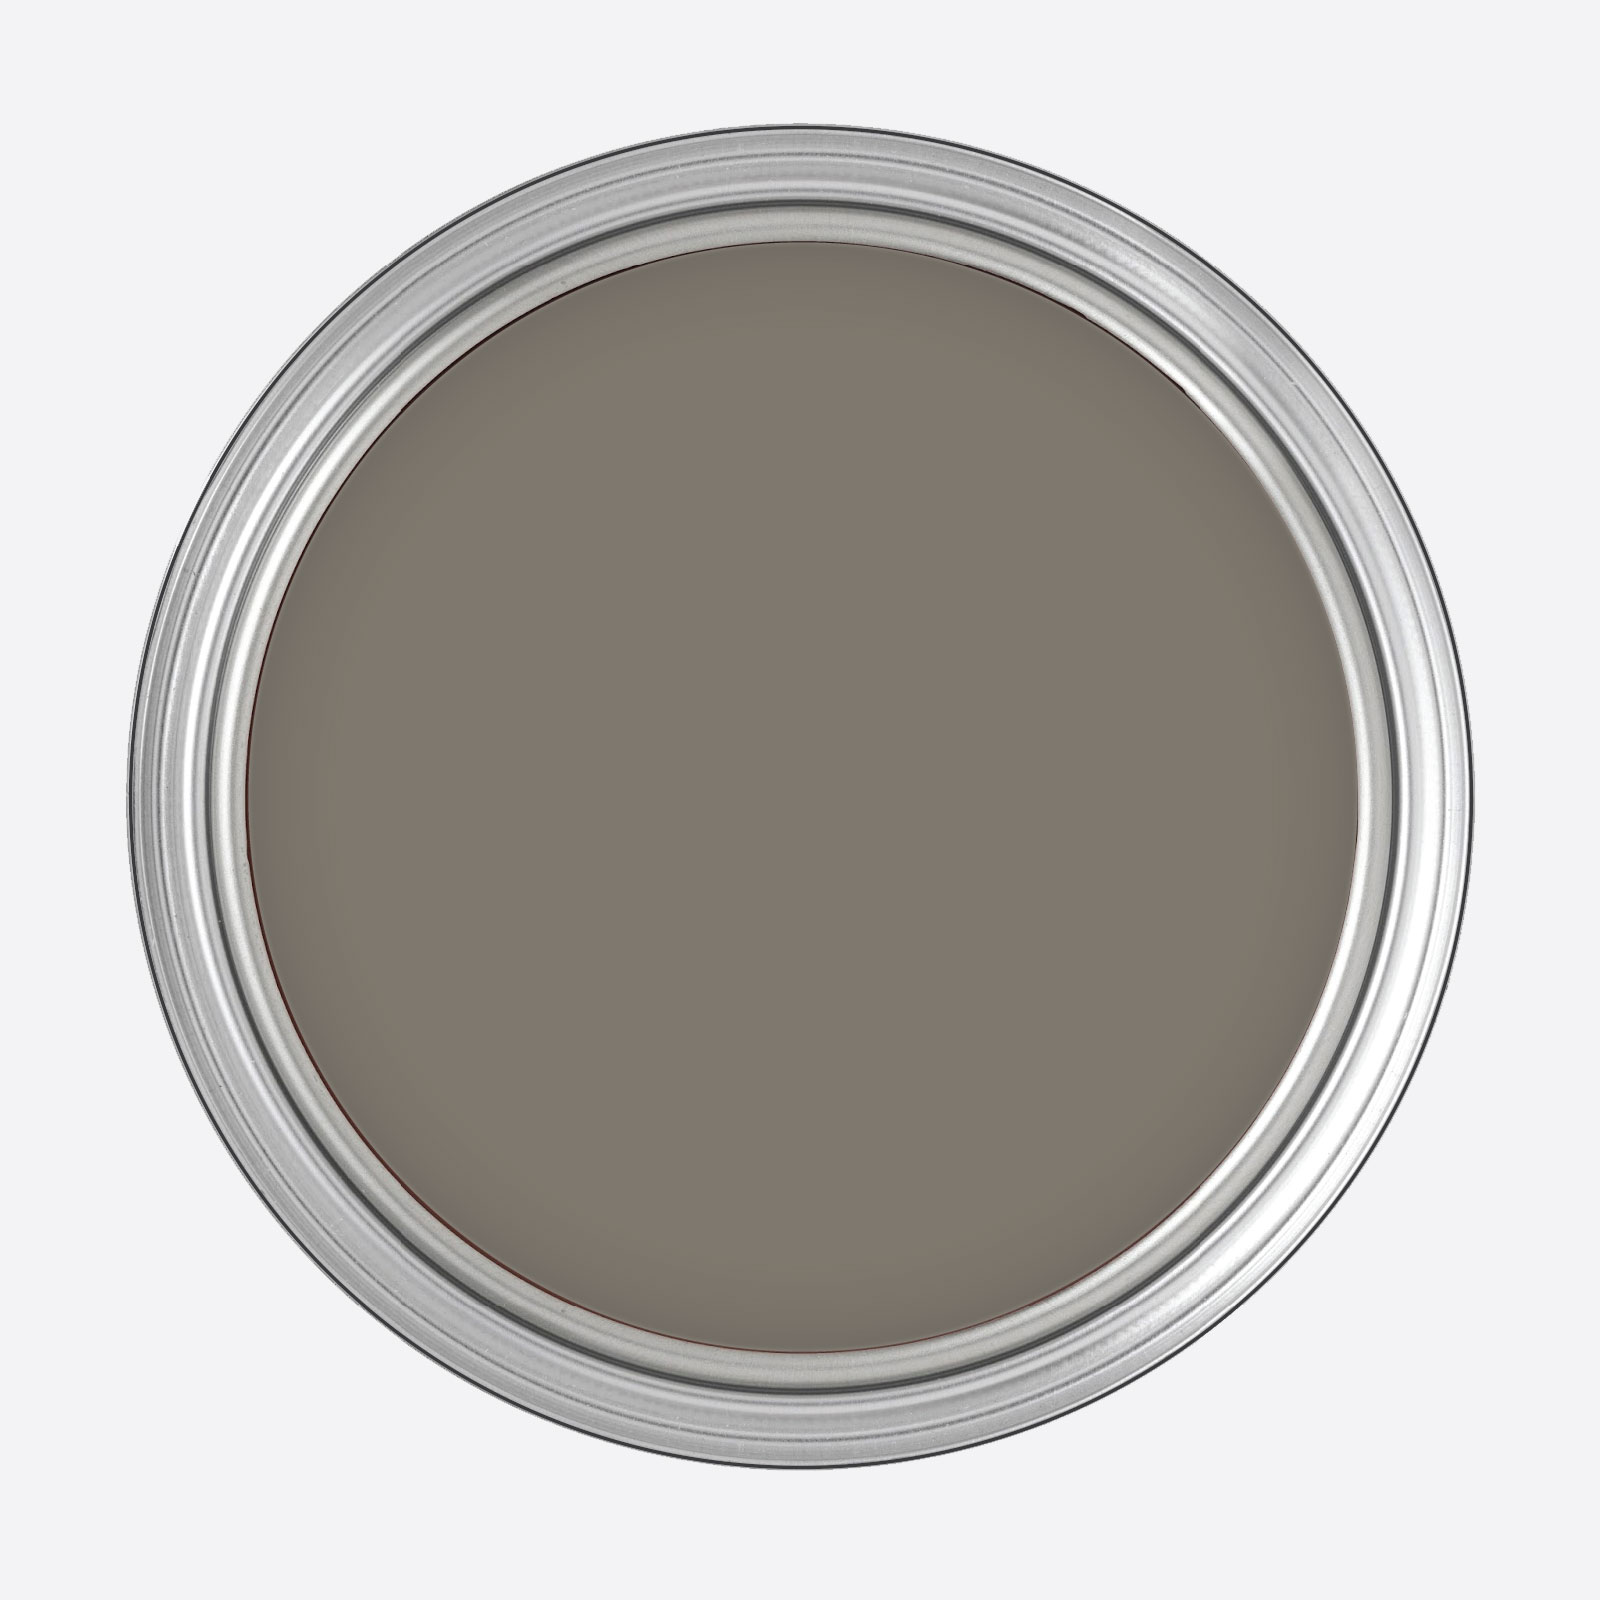 Linoljefärg 60% Grön Umbra Natur, 0.16 L